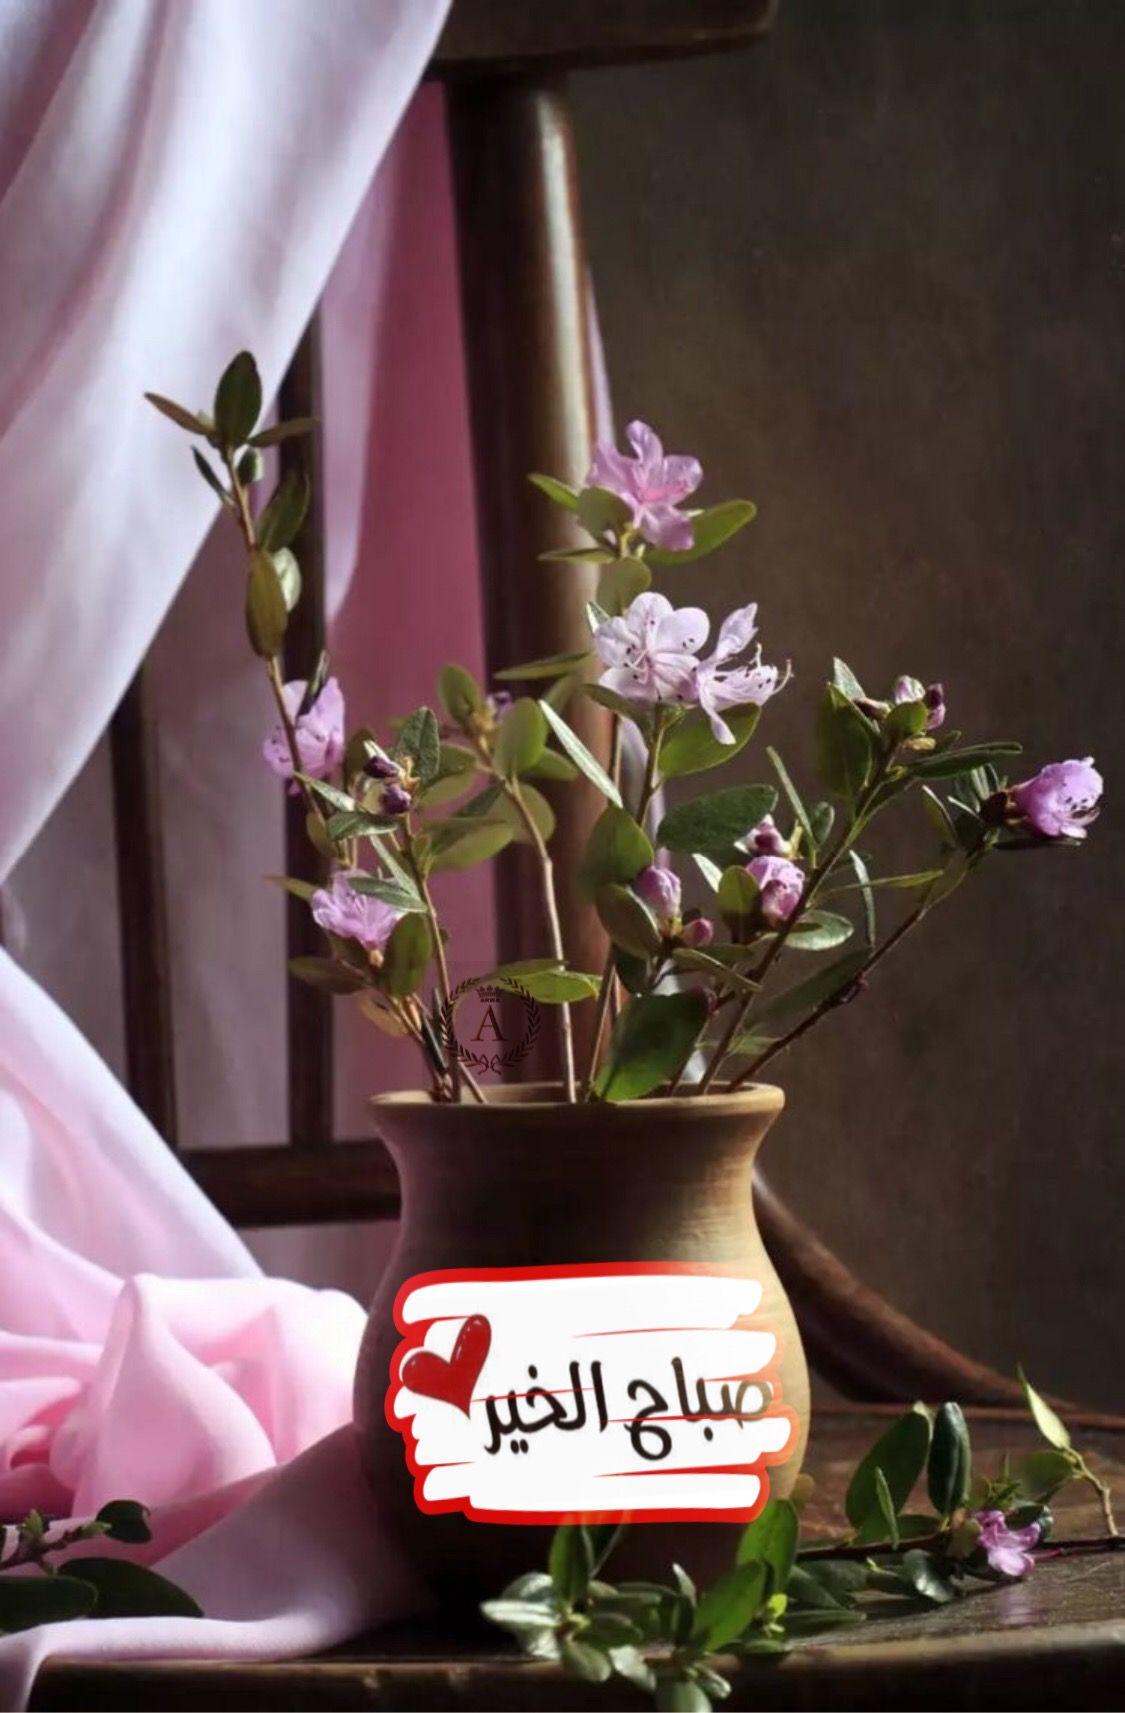 Pin By Rere On صباح الخير Good Morning Greetings Good Morning Quotes Morning Greeting